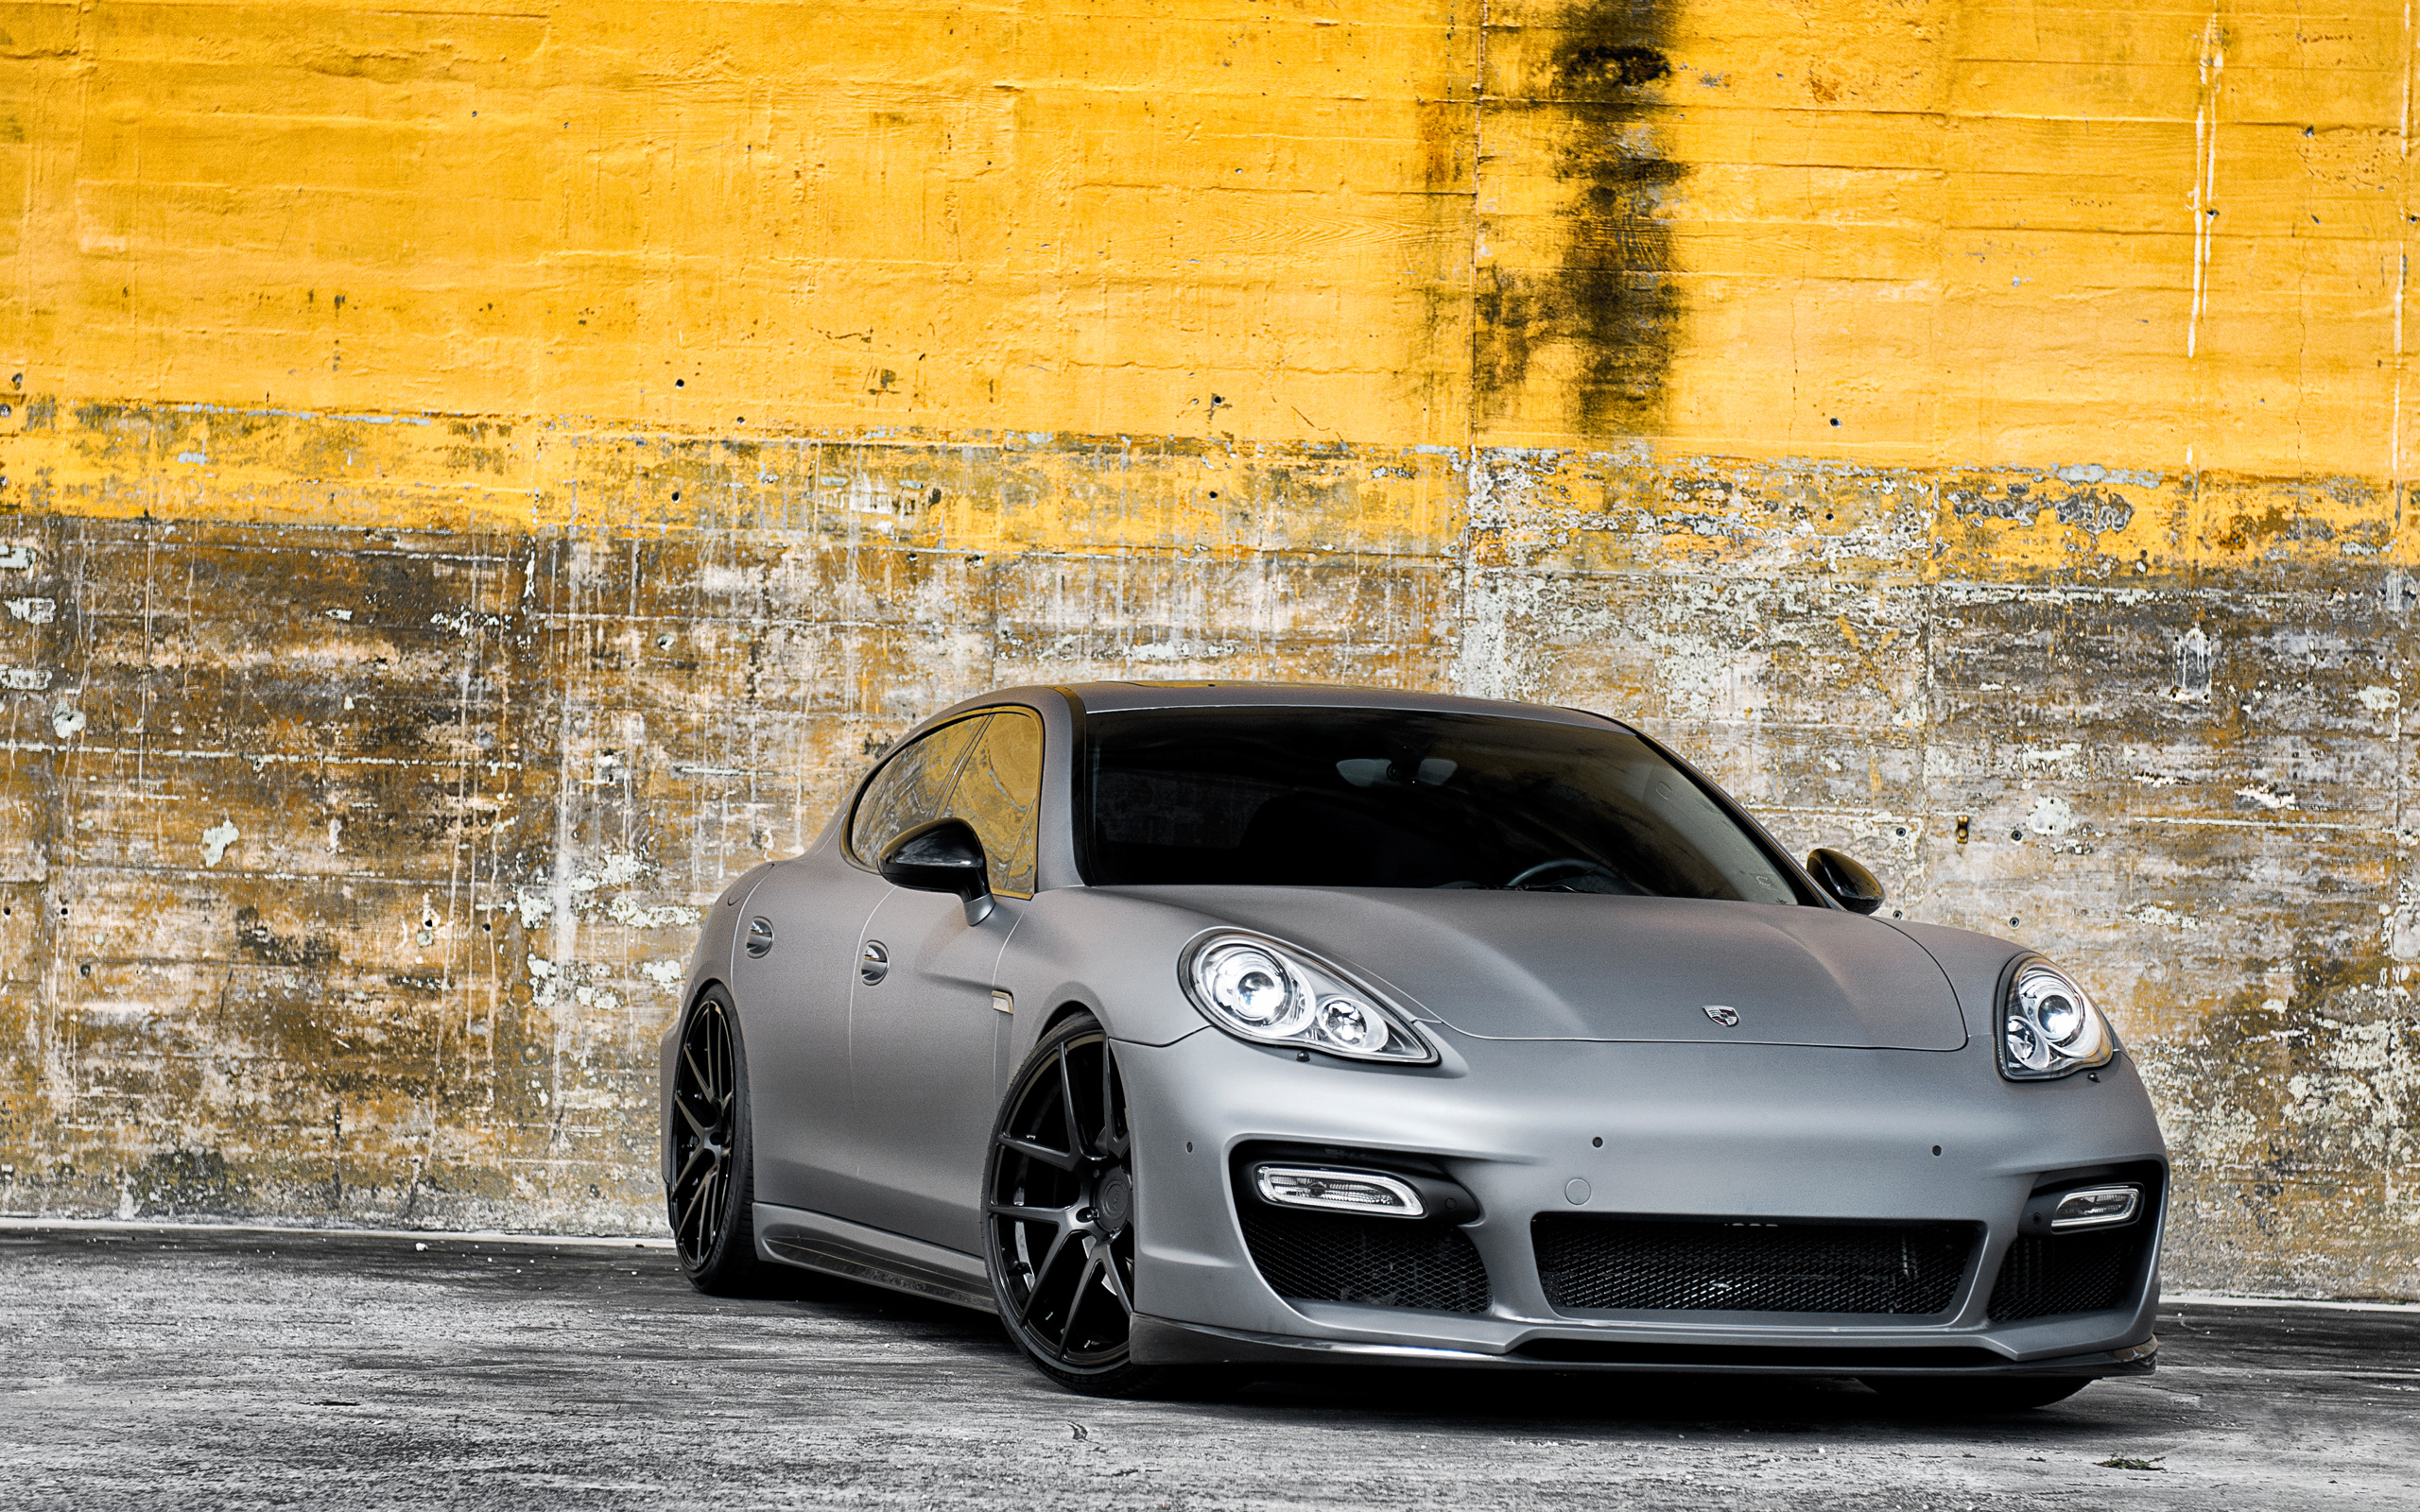 Porsche Panamera Hd Wallpapers 1080p 2560x1600